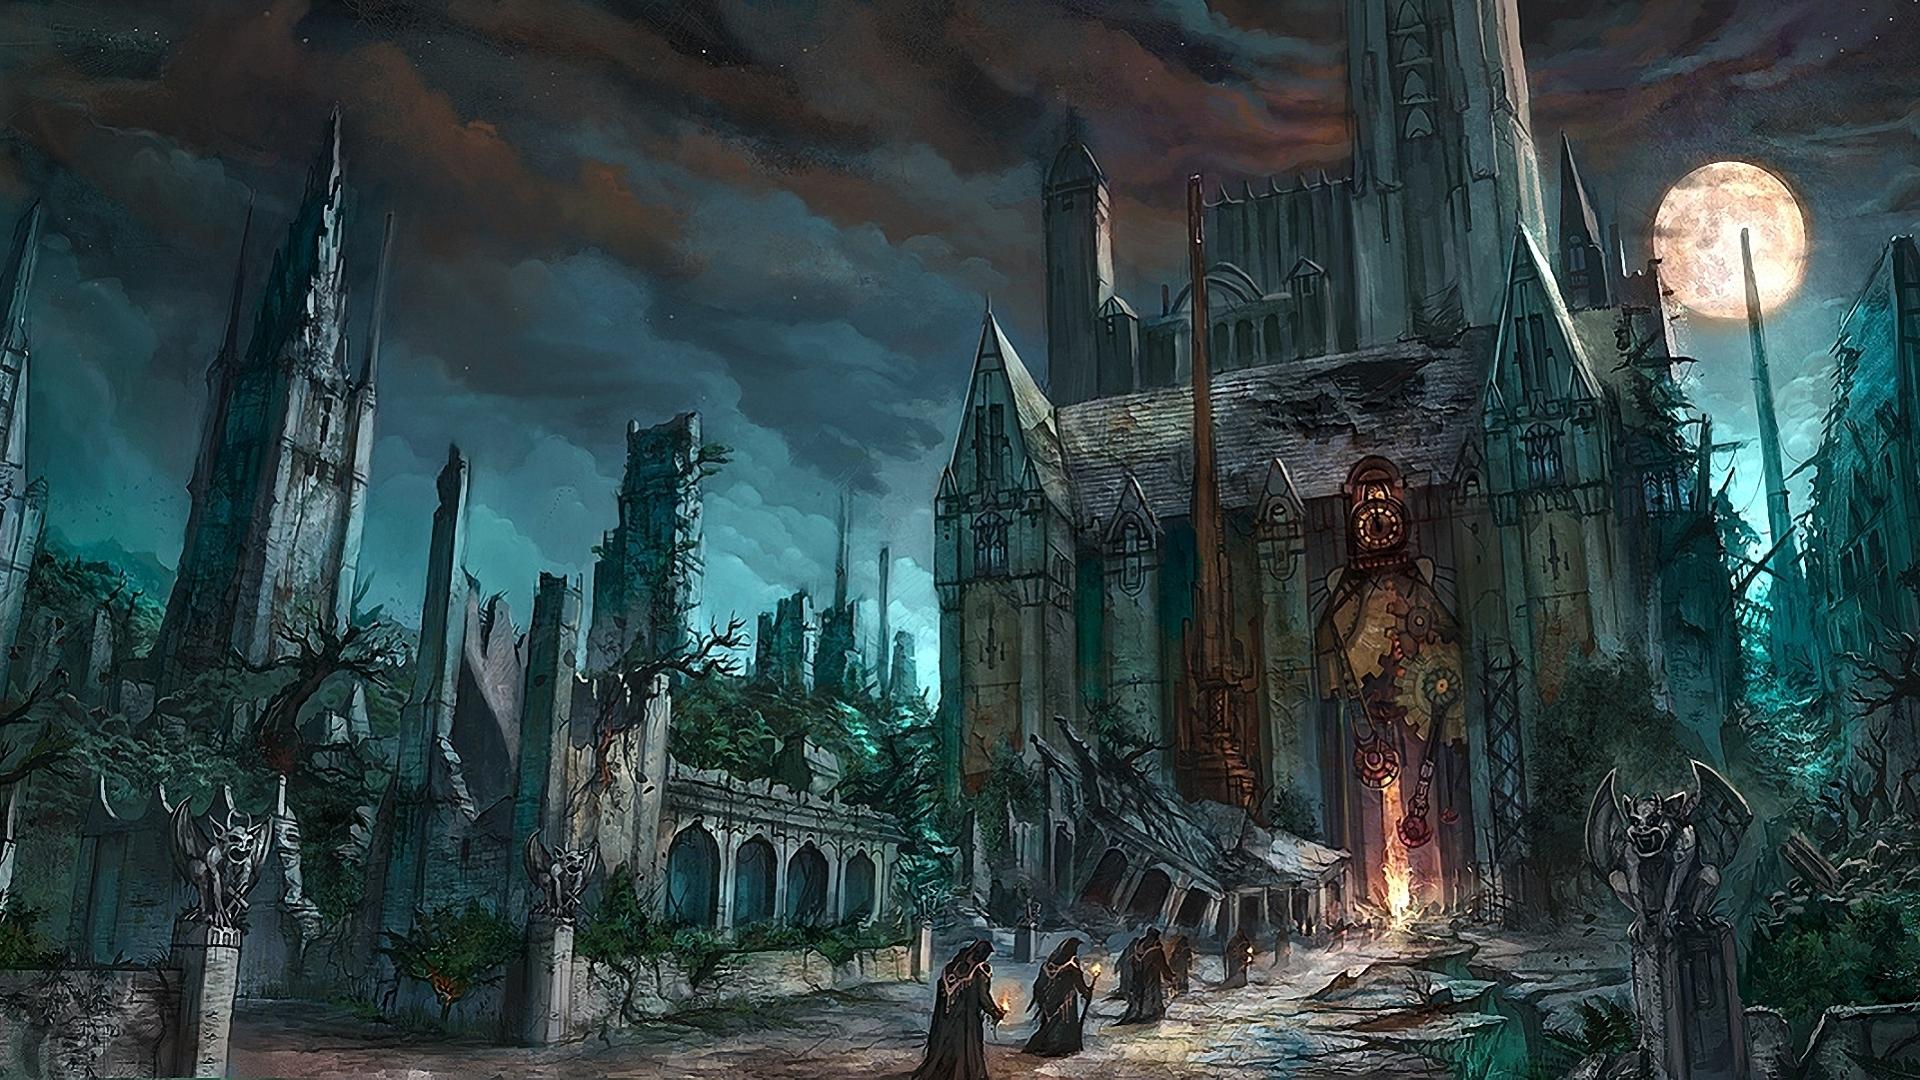 dark fantasy horror gothic art monk cathedral church wallpaper 1920x1080